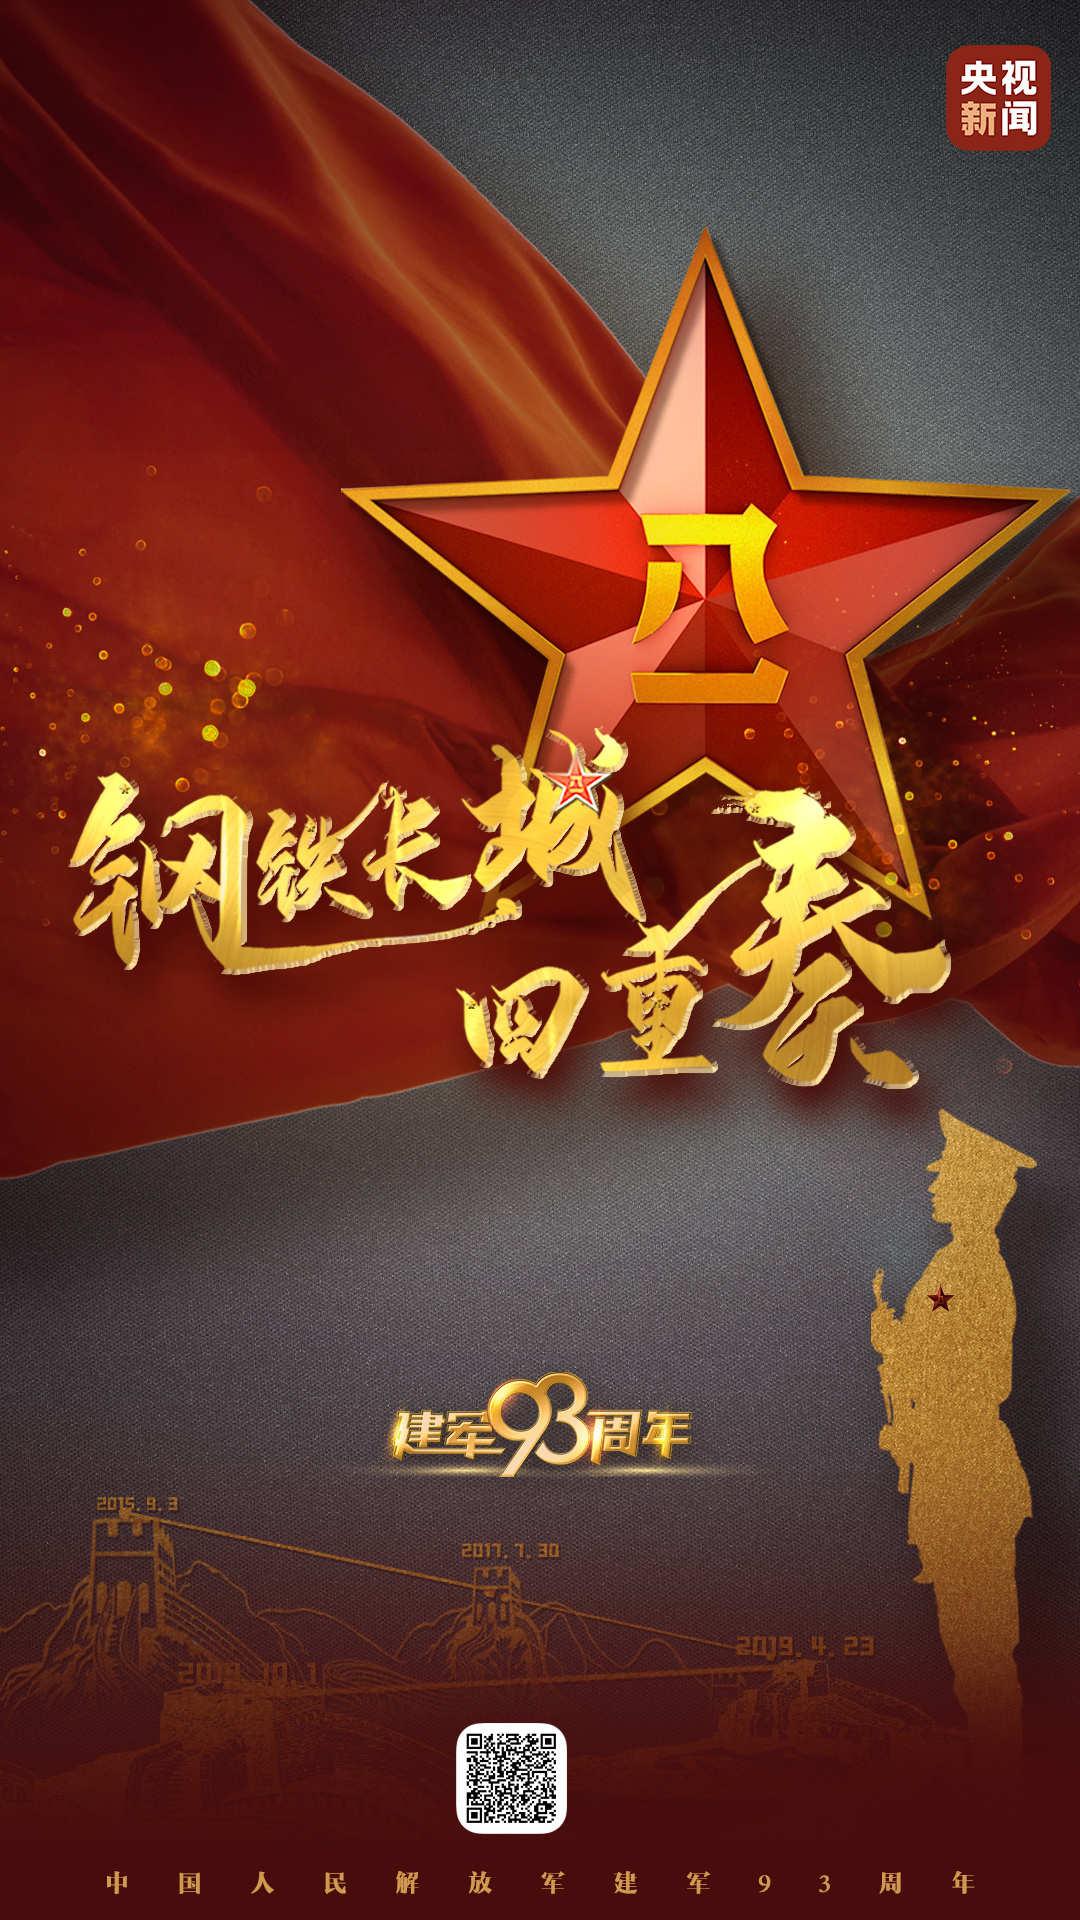 http://www.weixinrensheng.com/qichekong/2231623.html